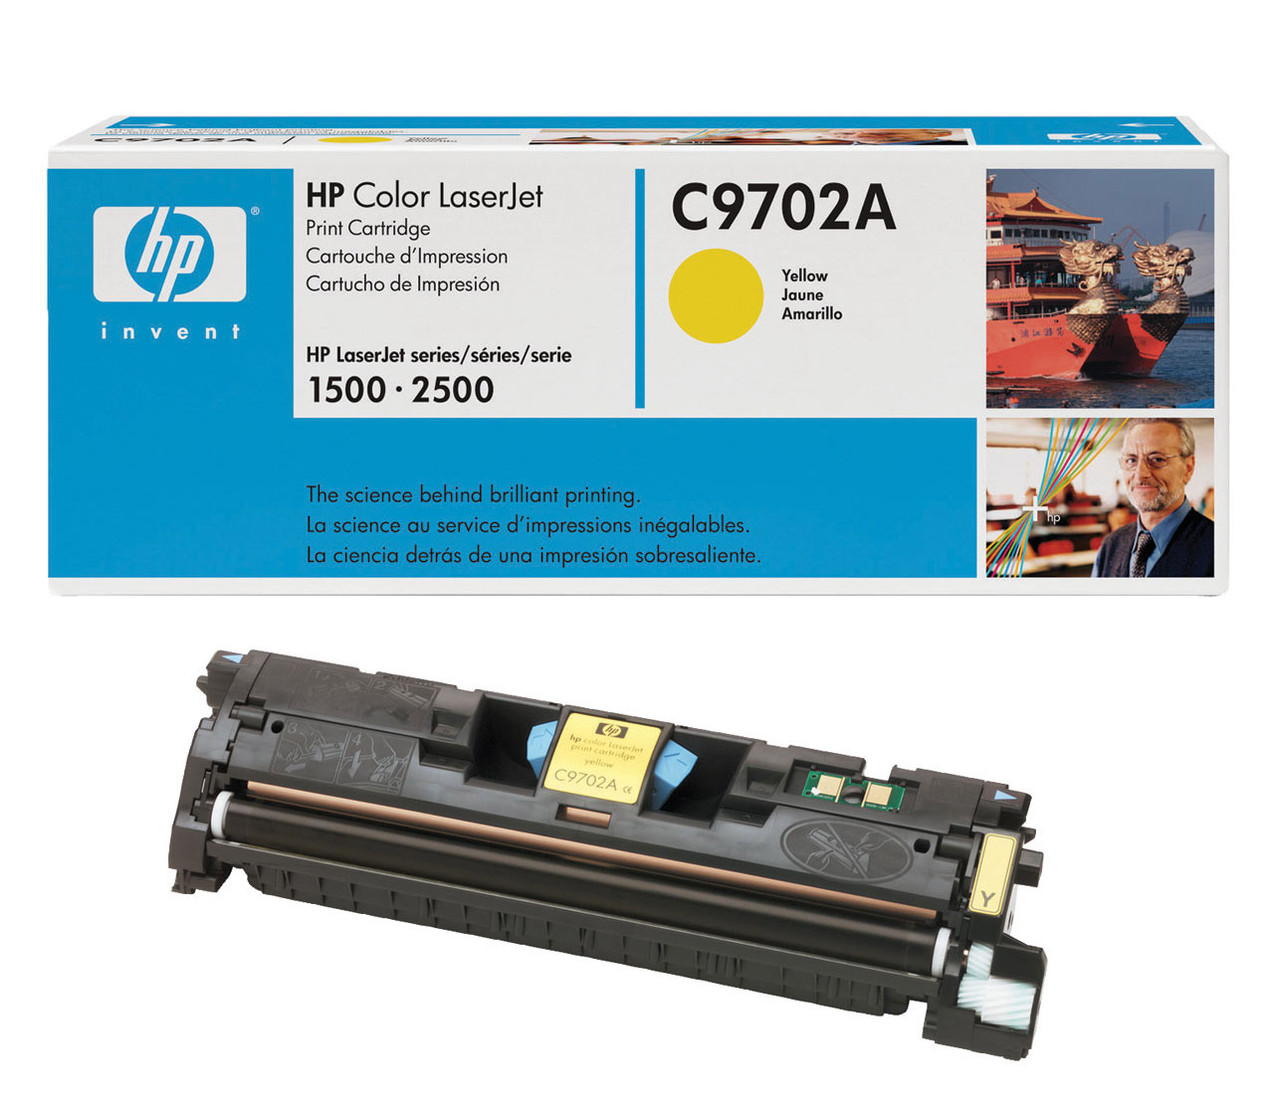 Заправка картриджа HP CLJ 1500/ 2500 yellow (C9702A)